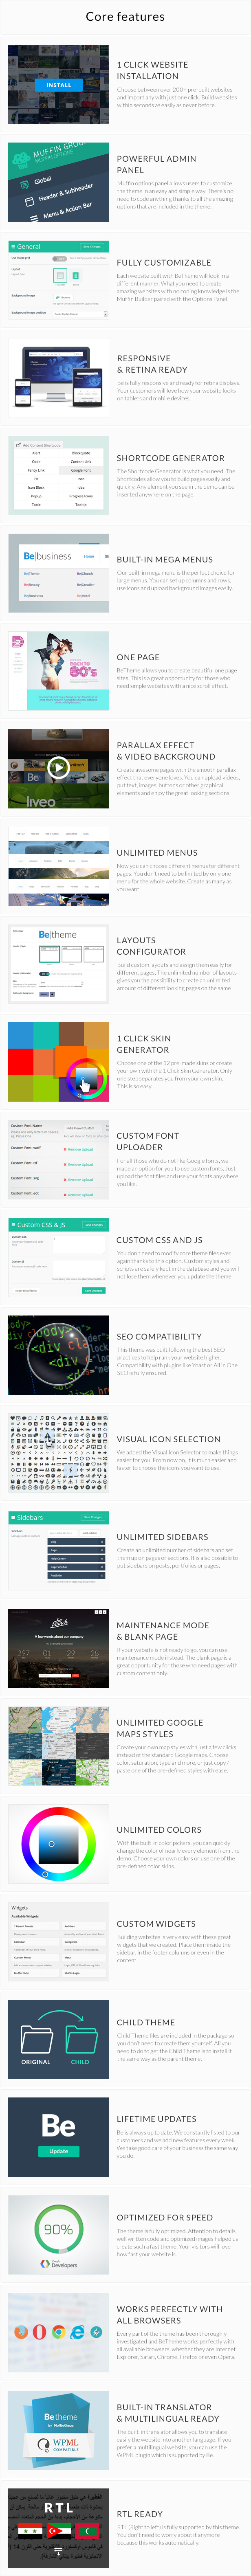 features2086 - BeTheme - Responsive Multi-Purpose WordPress Theme